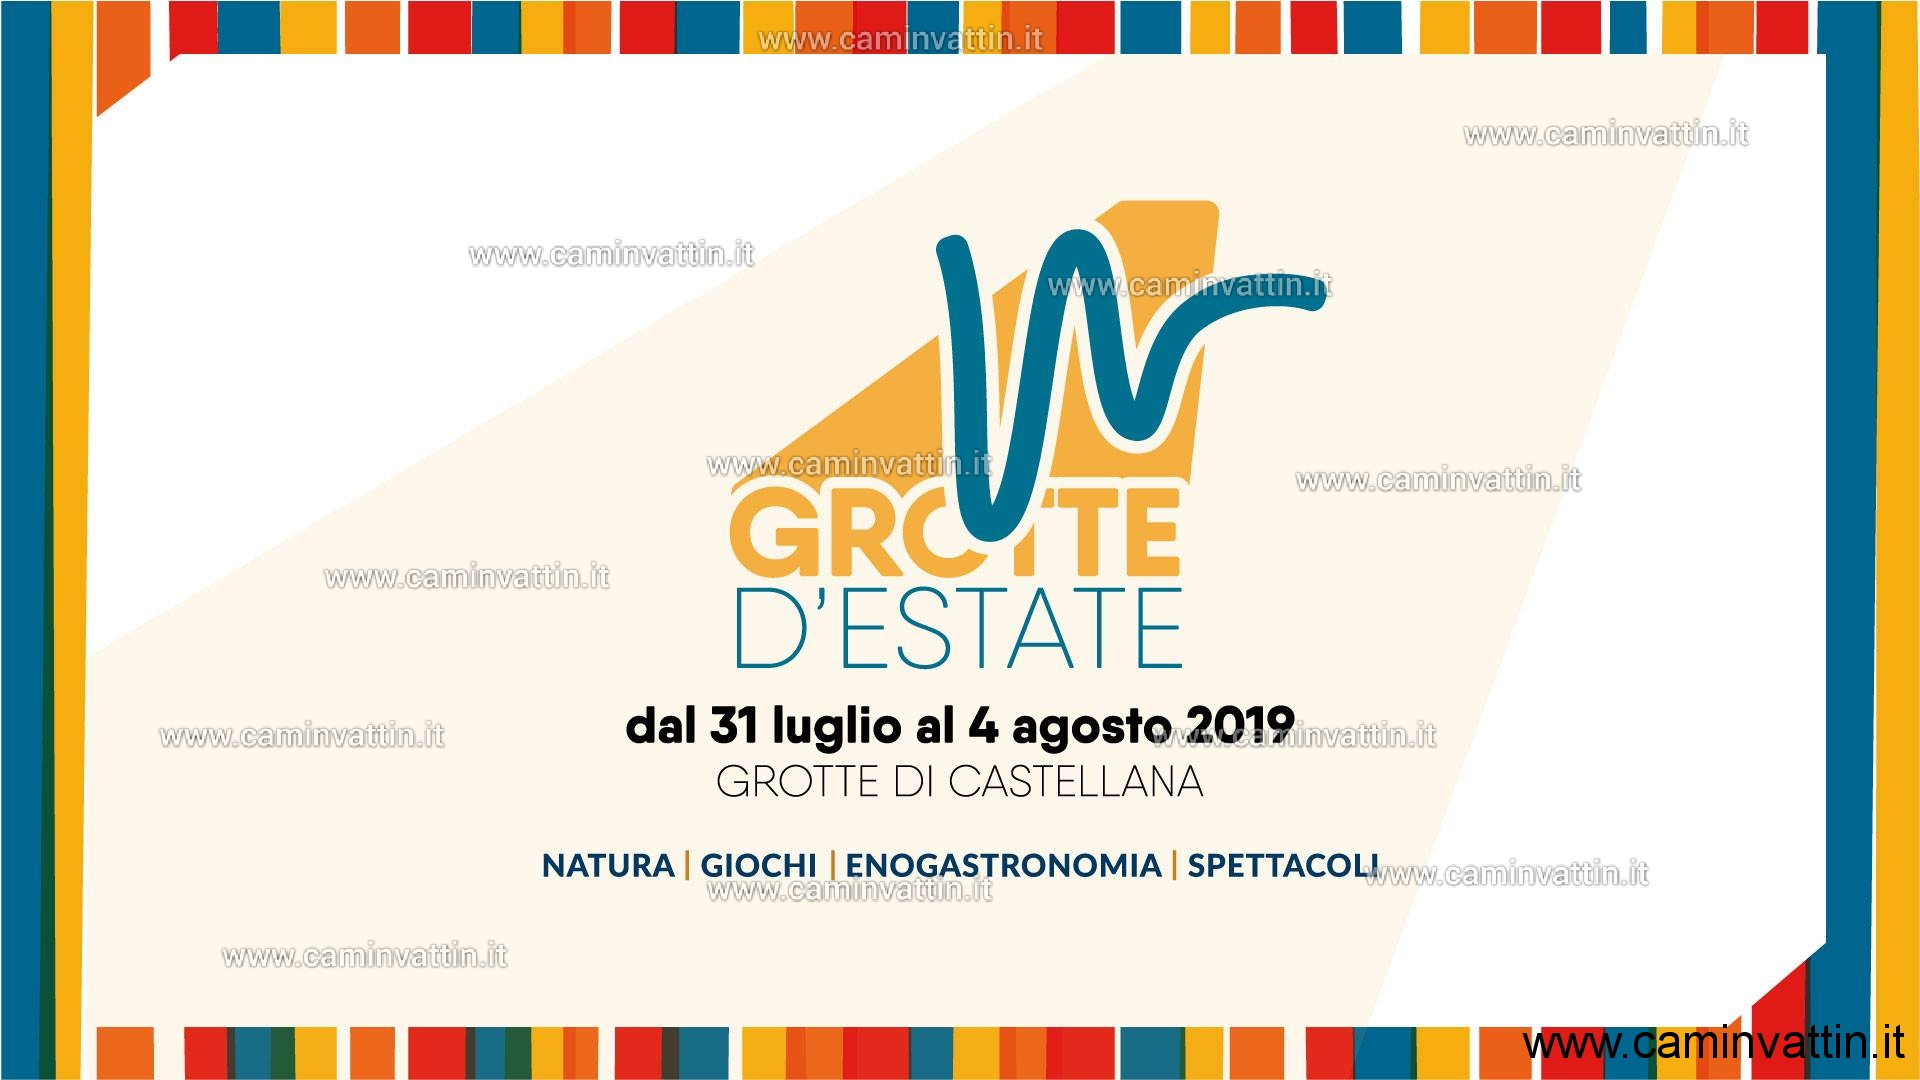 grotte d estate 2019 castellana